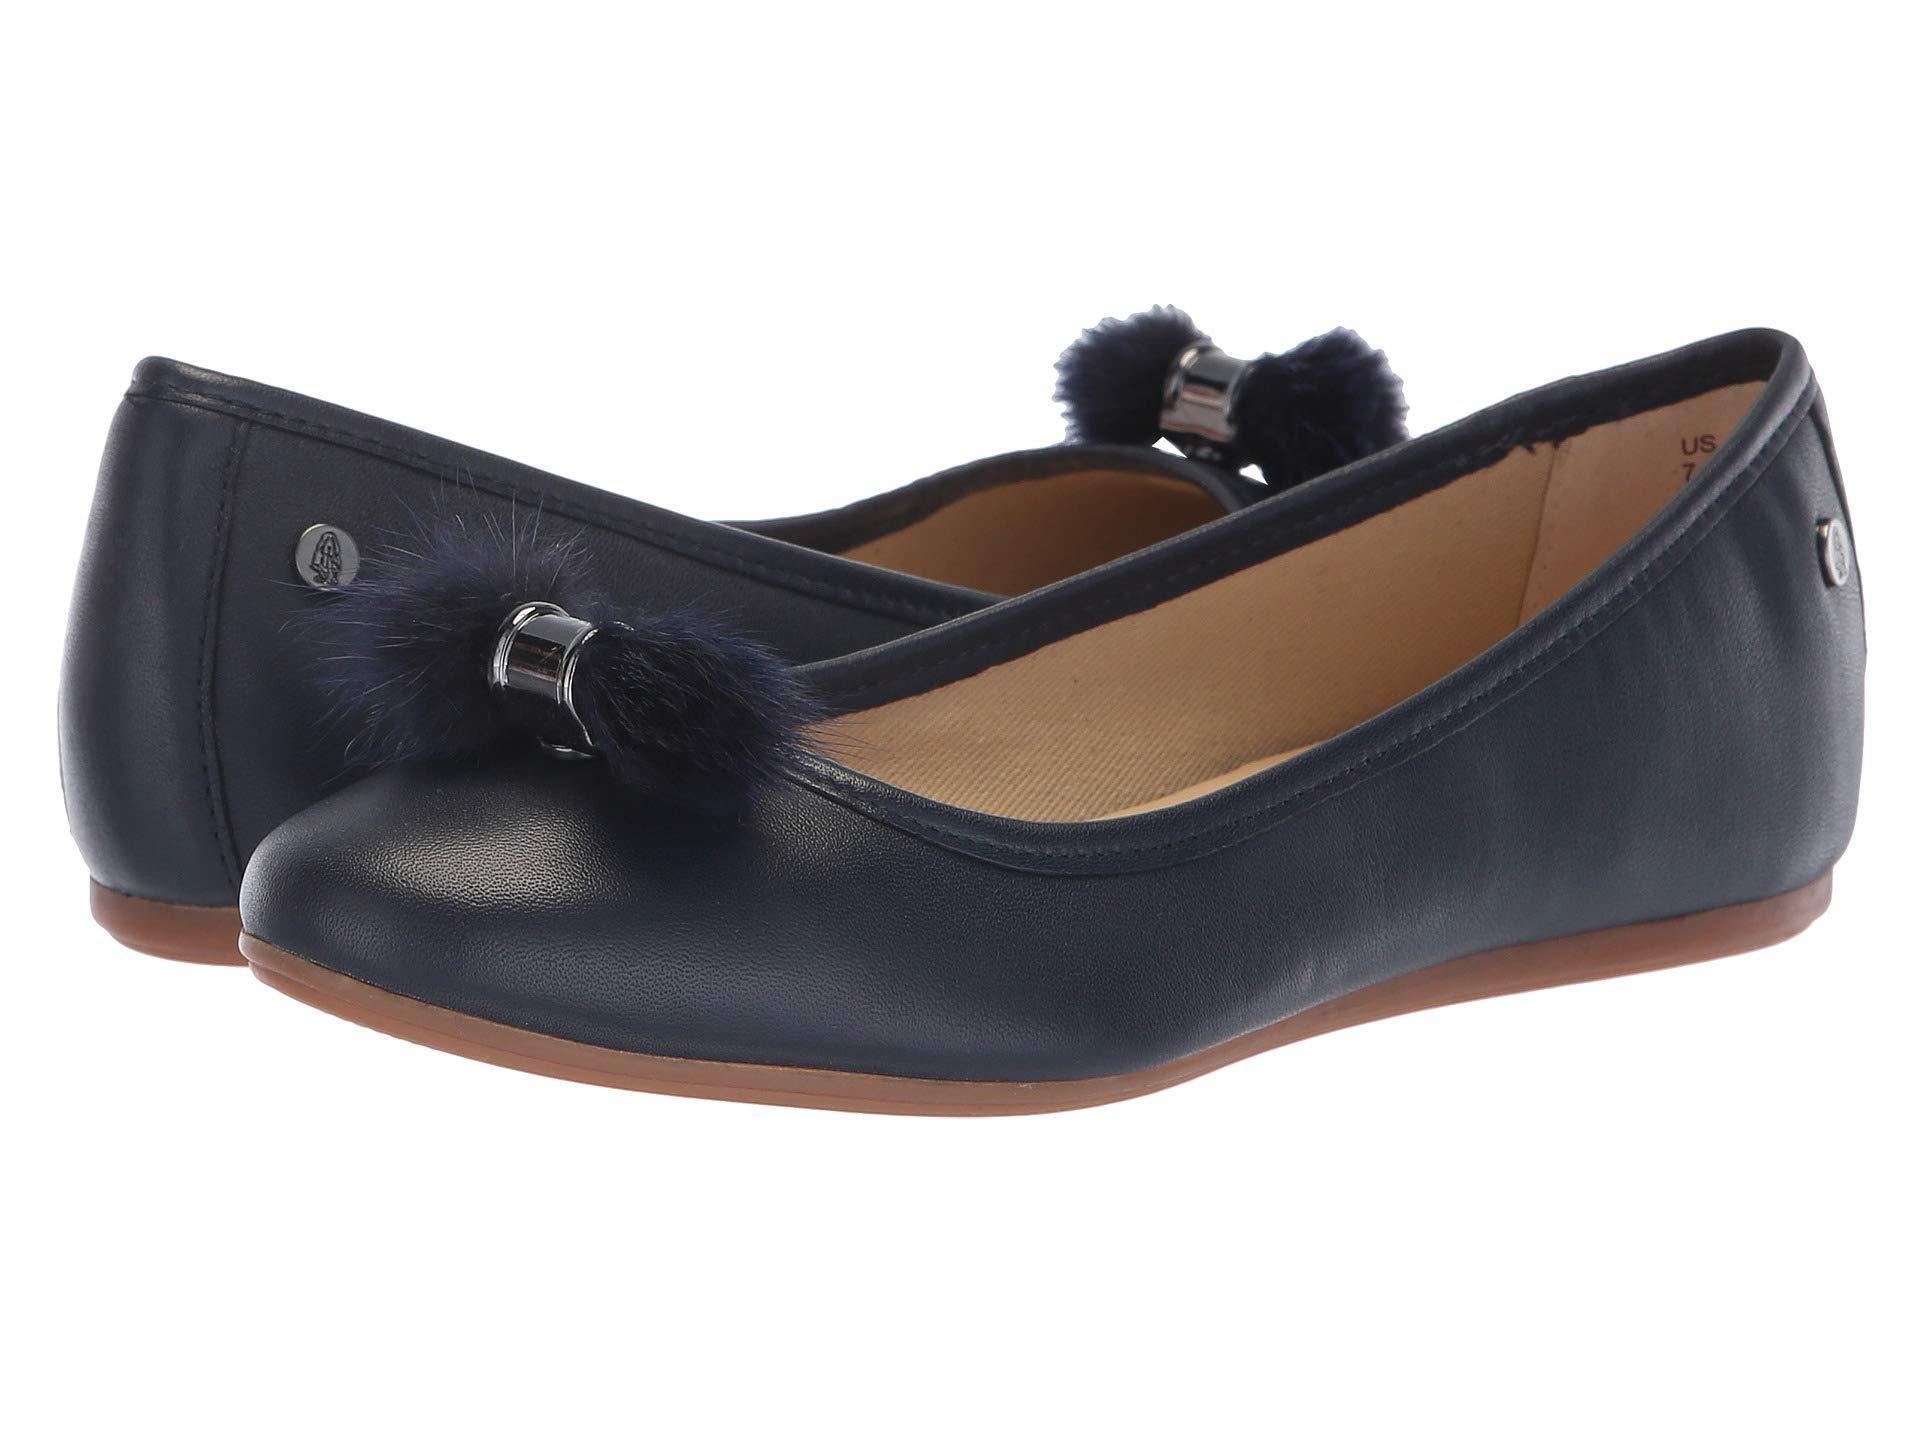 bacdb55386b Lyst - Hush Puppies Heather Puff Ballet (black Leather) Women s Slip ...